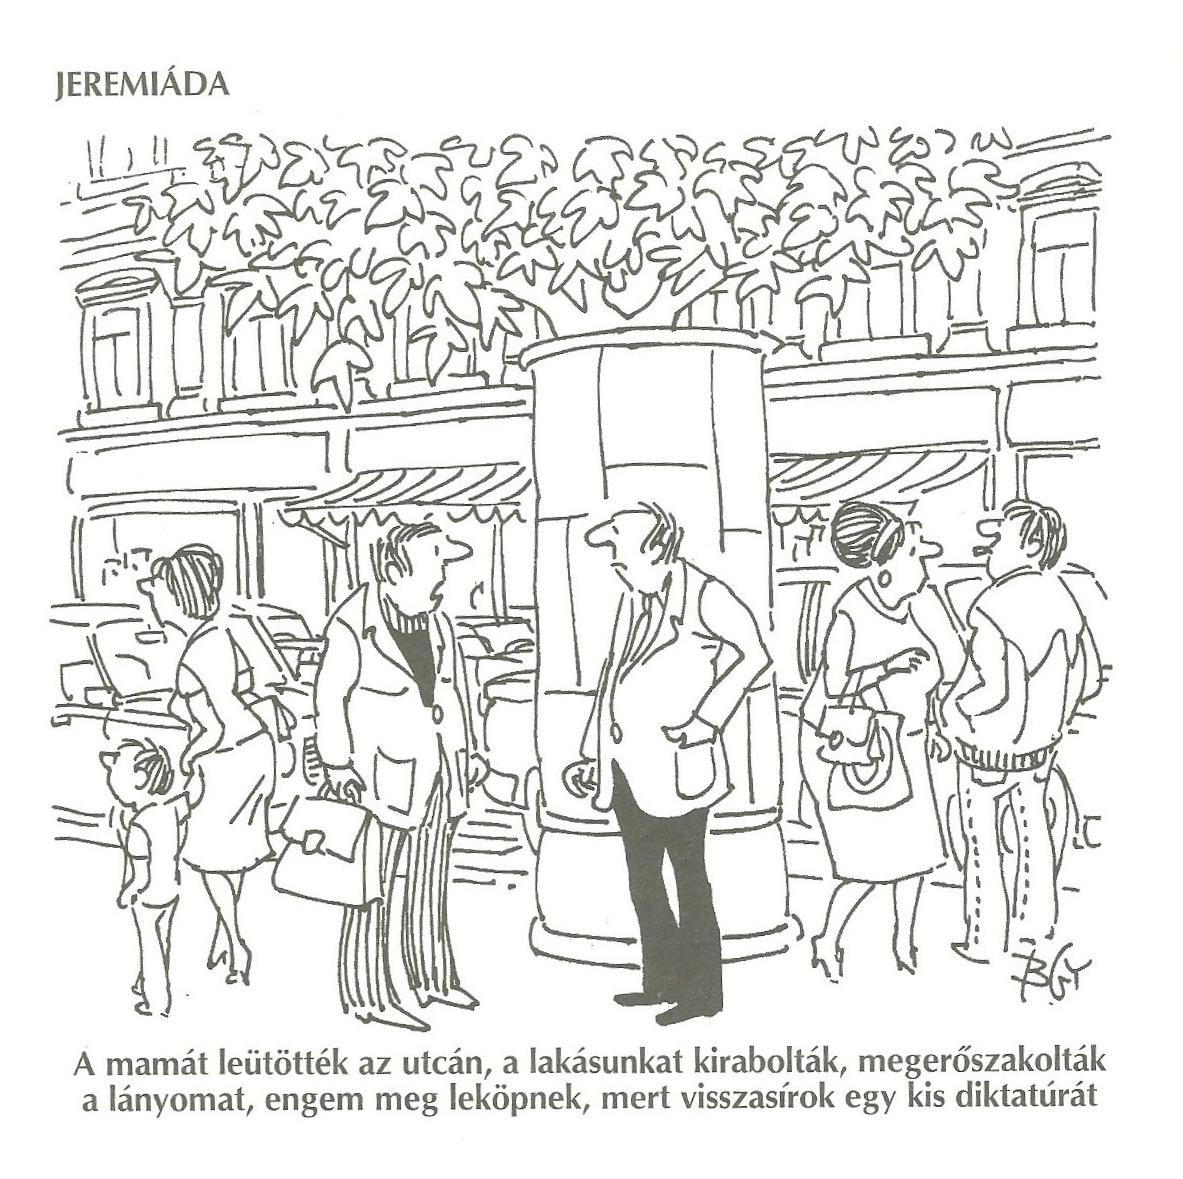 Jeremiada